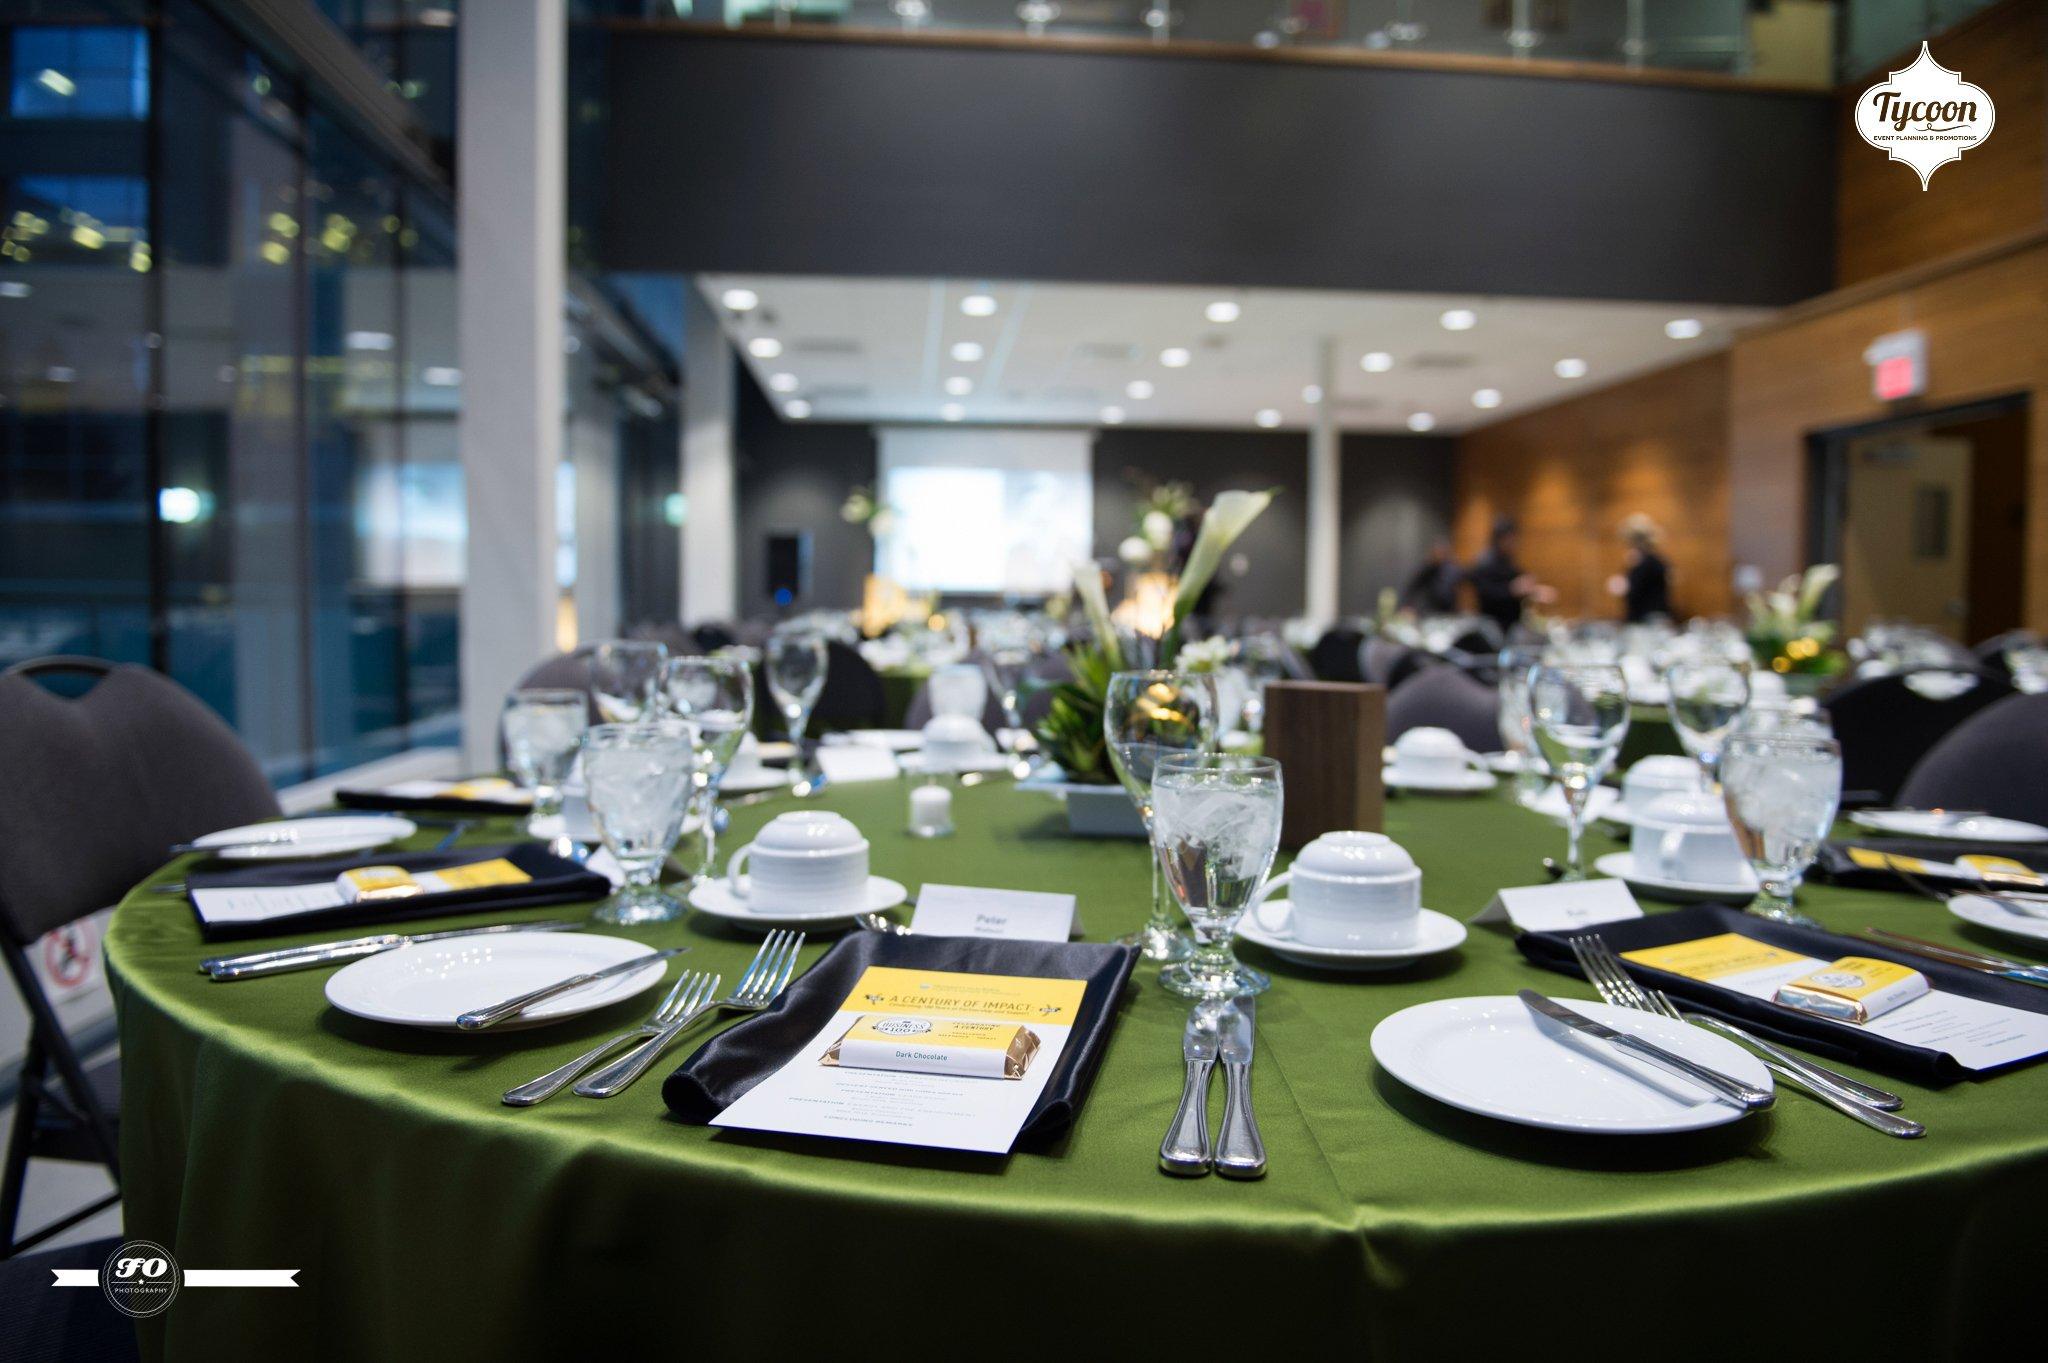 alberta school of business vip reception  u0026 dinner  u2013 tycoon event planning  u0026 promotions